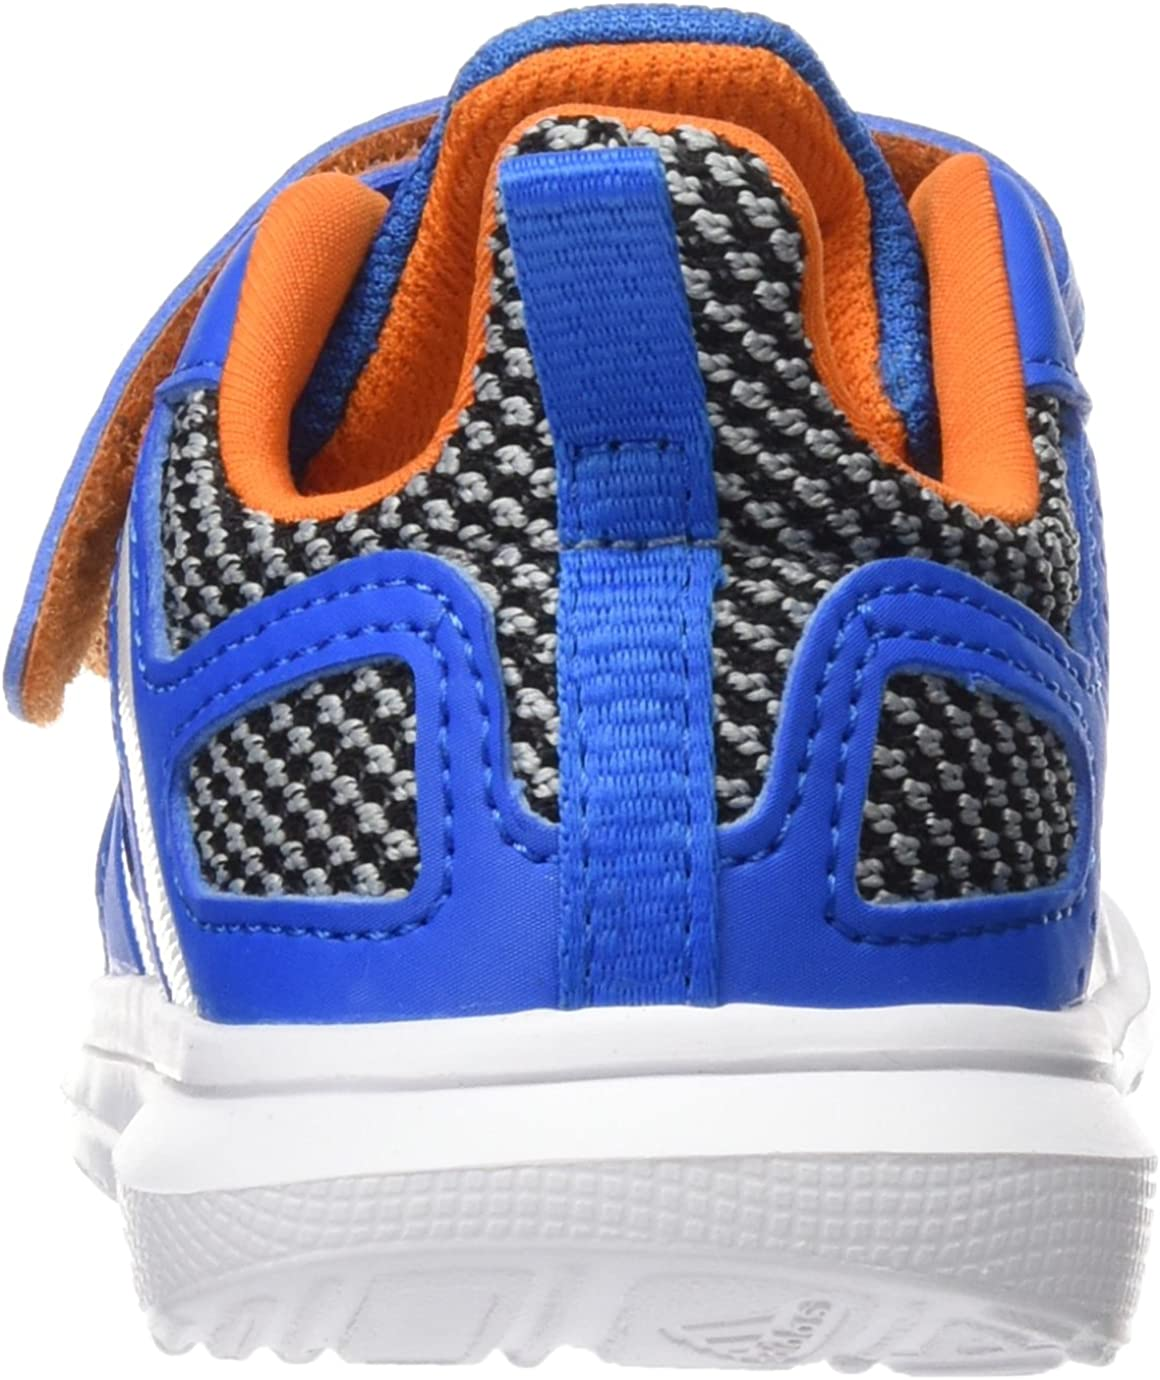 adidas Hyperfast 2.0 CF I, Chaussures de Running Compétition Mixte Enfant Azur